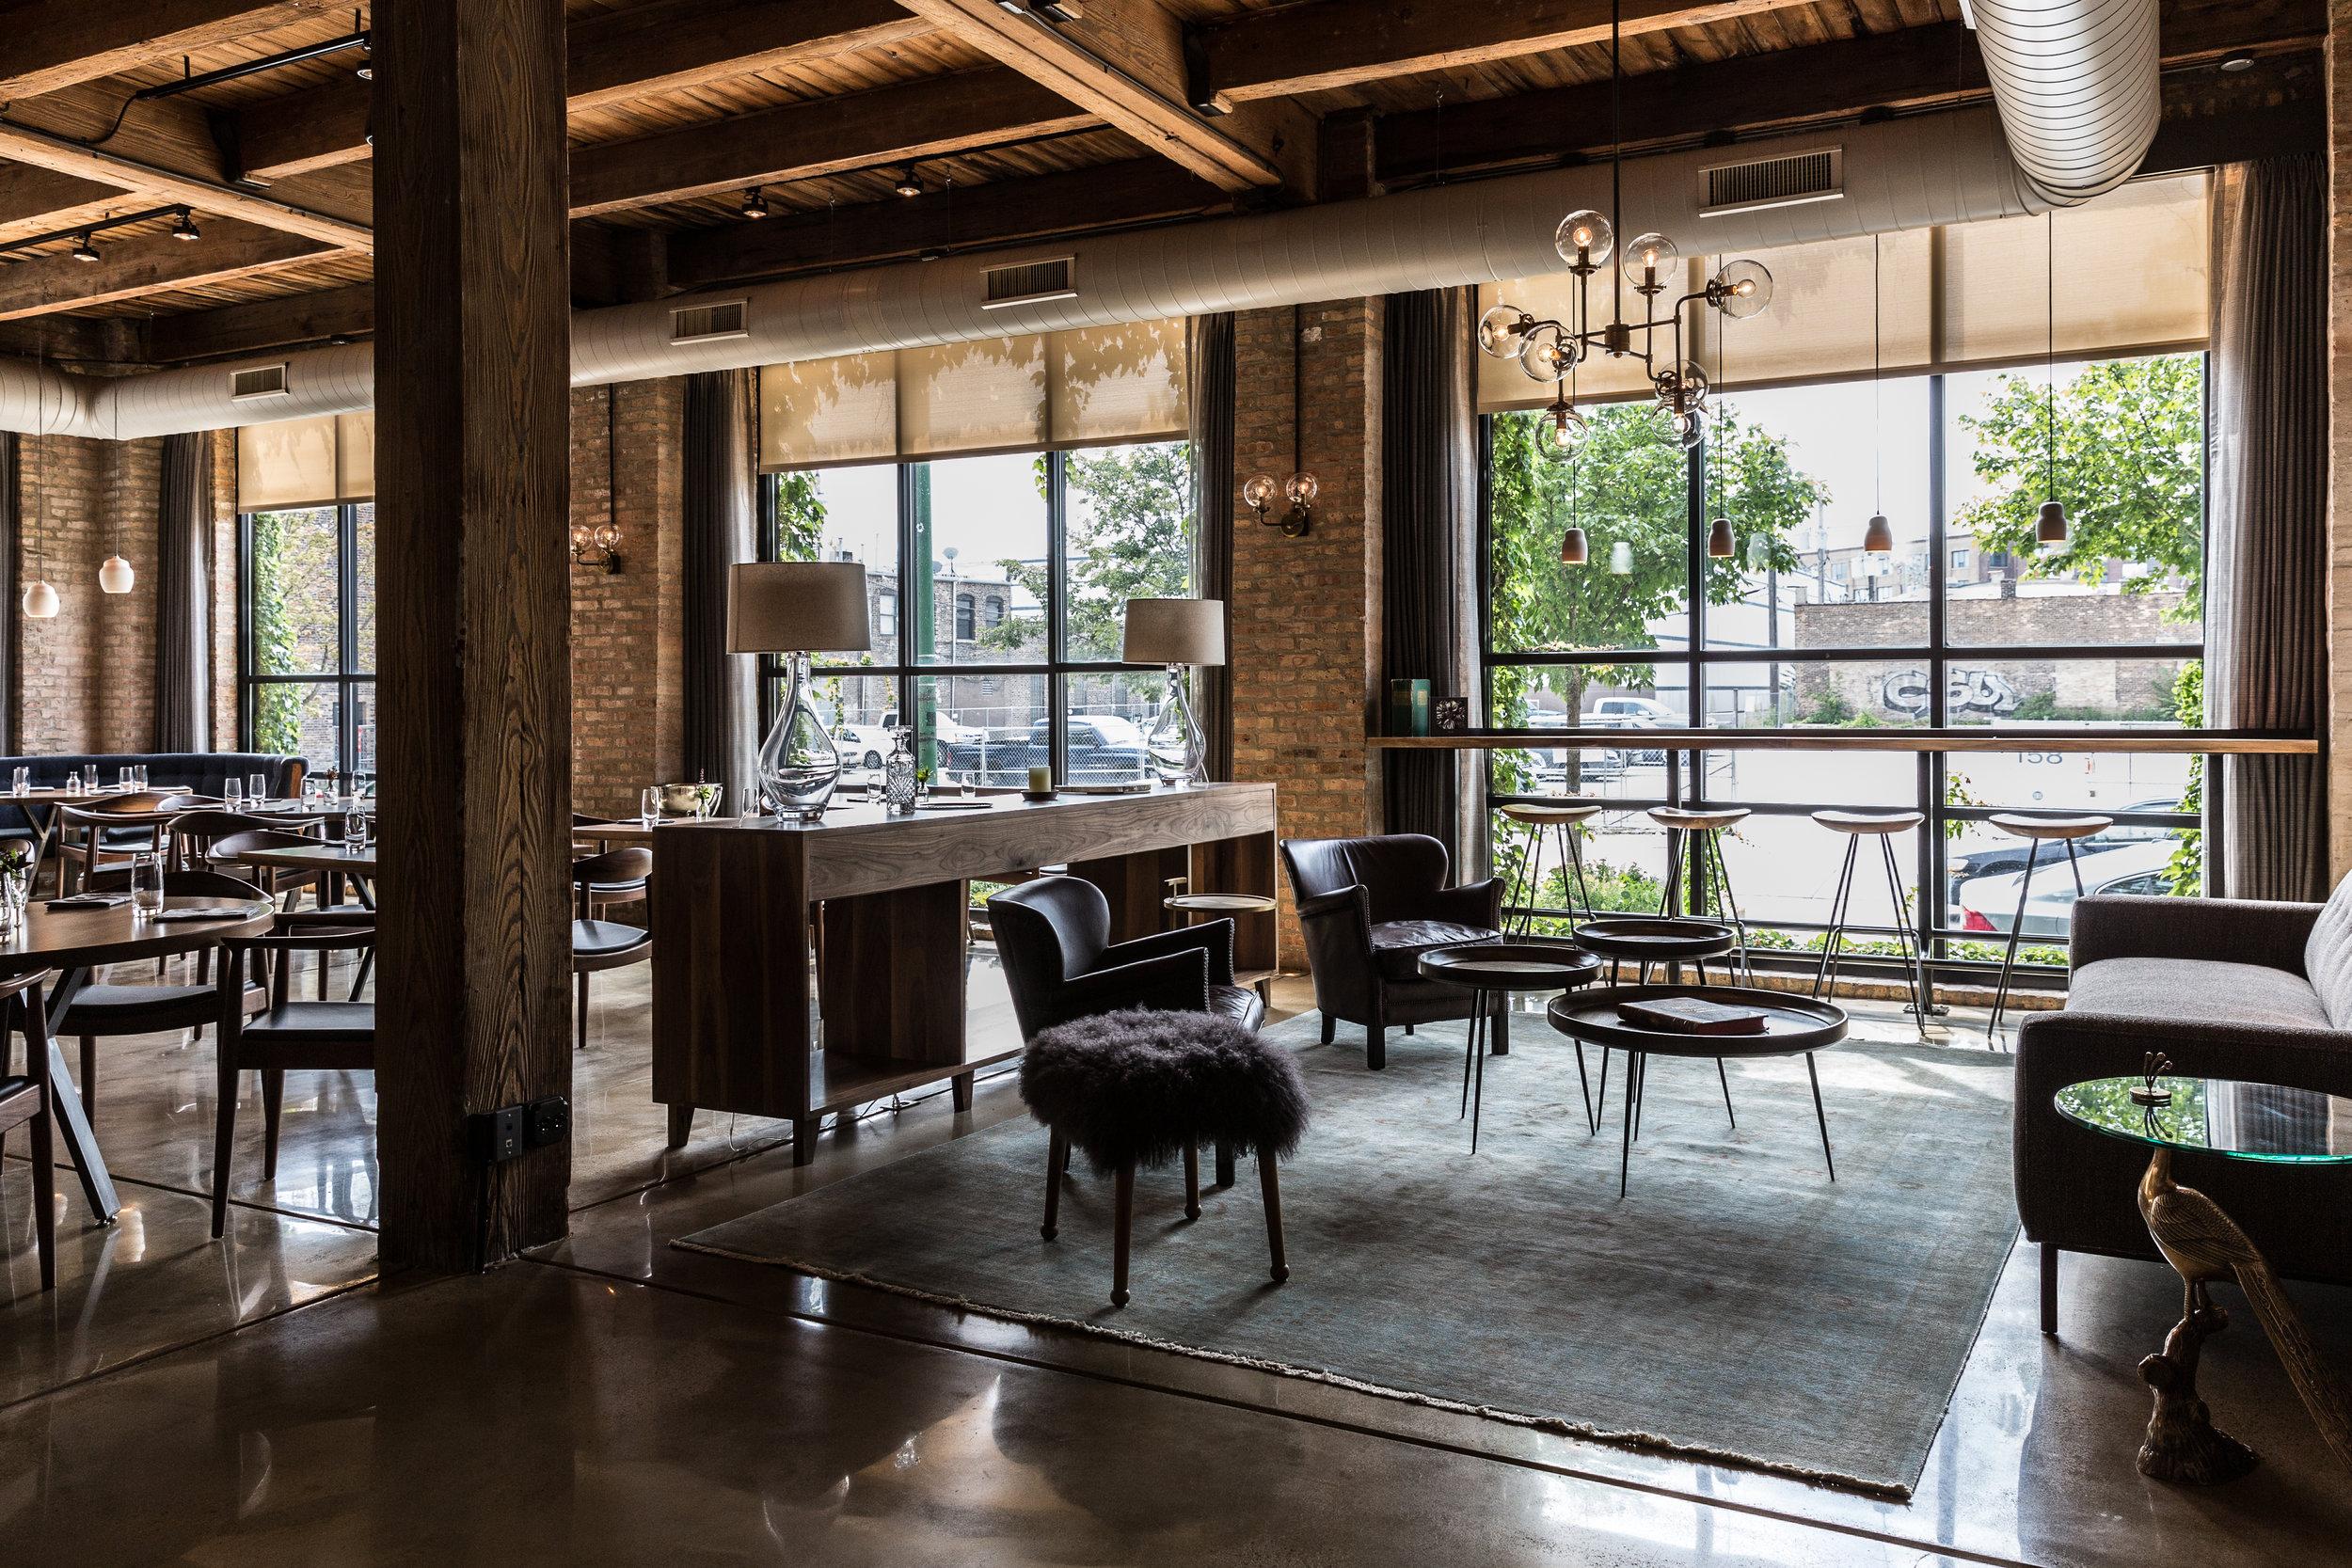 studio-saint-bars-and-restaurants-smyth-and-the-loyalist-washington-dc-4